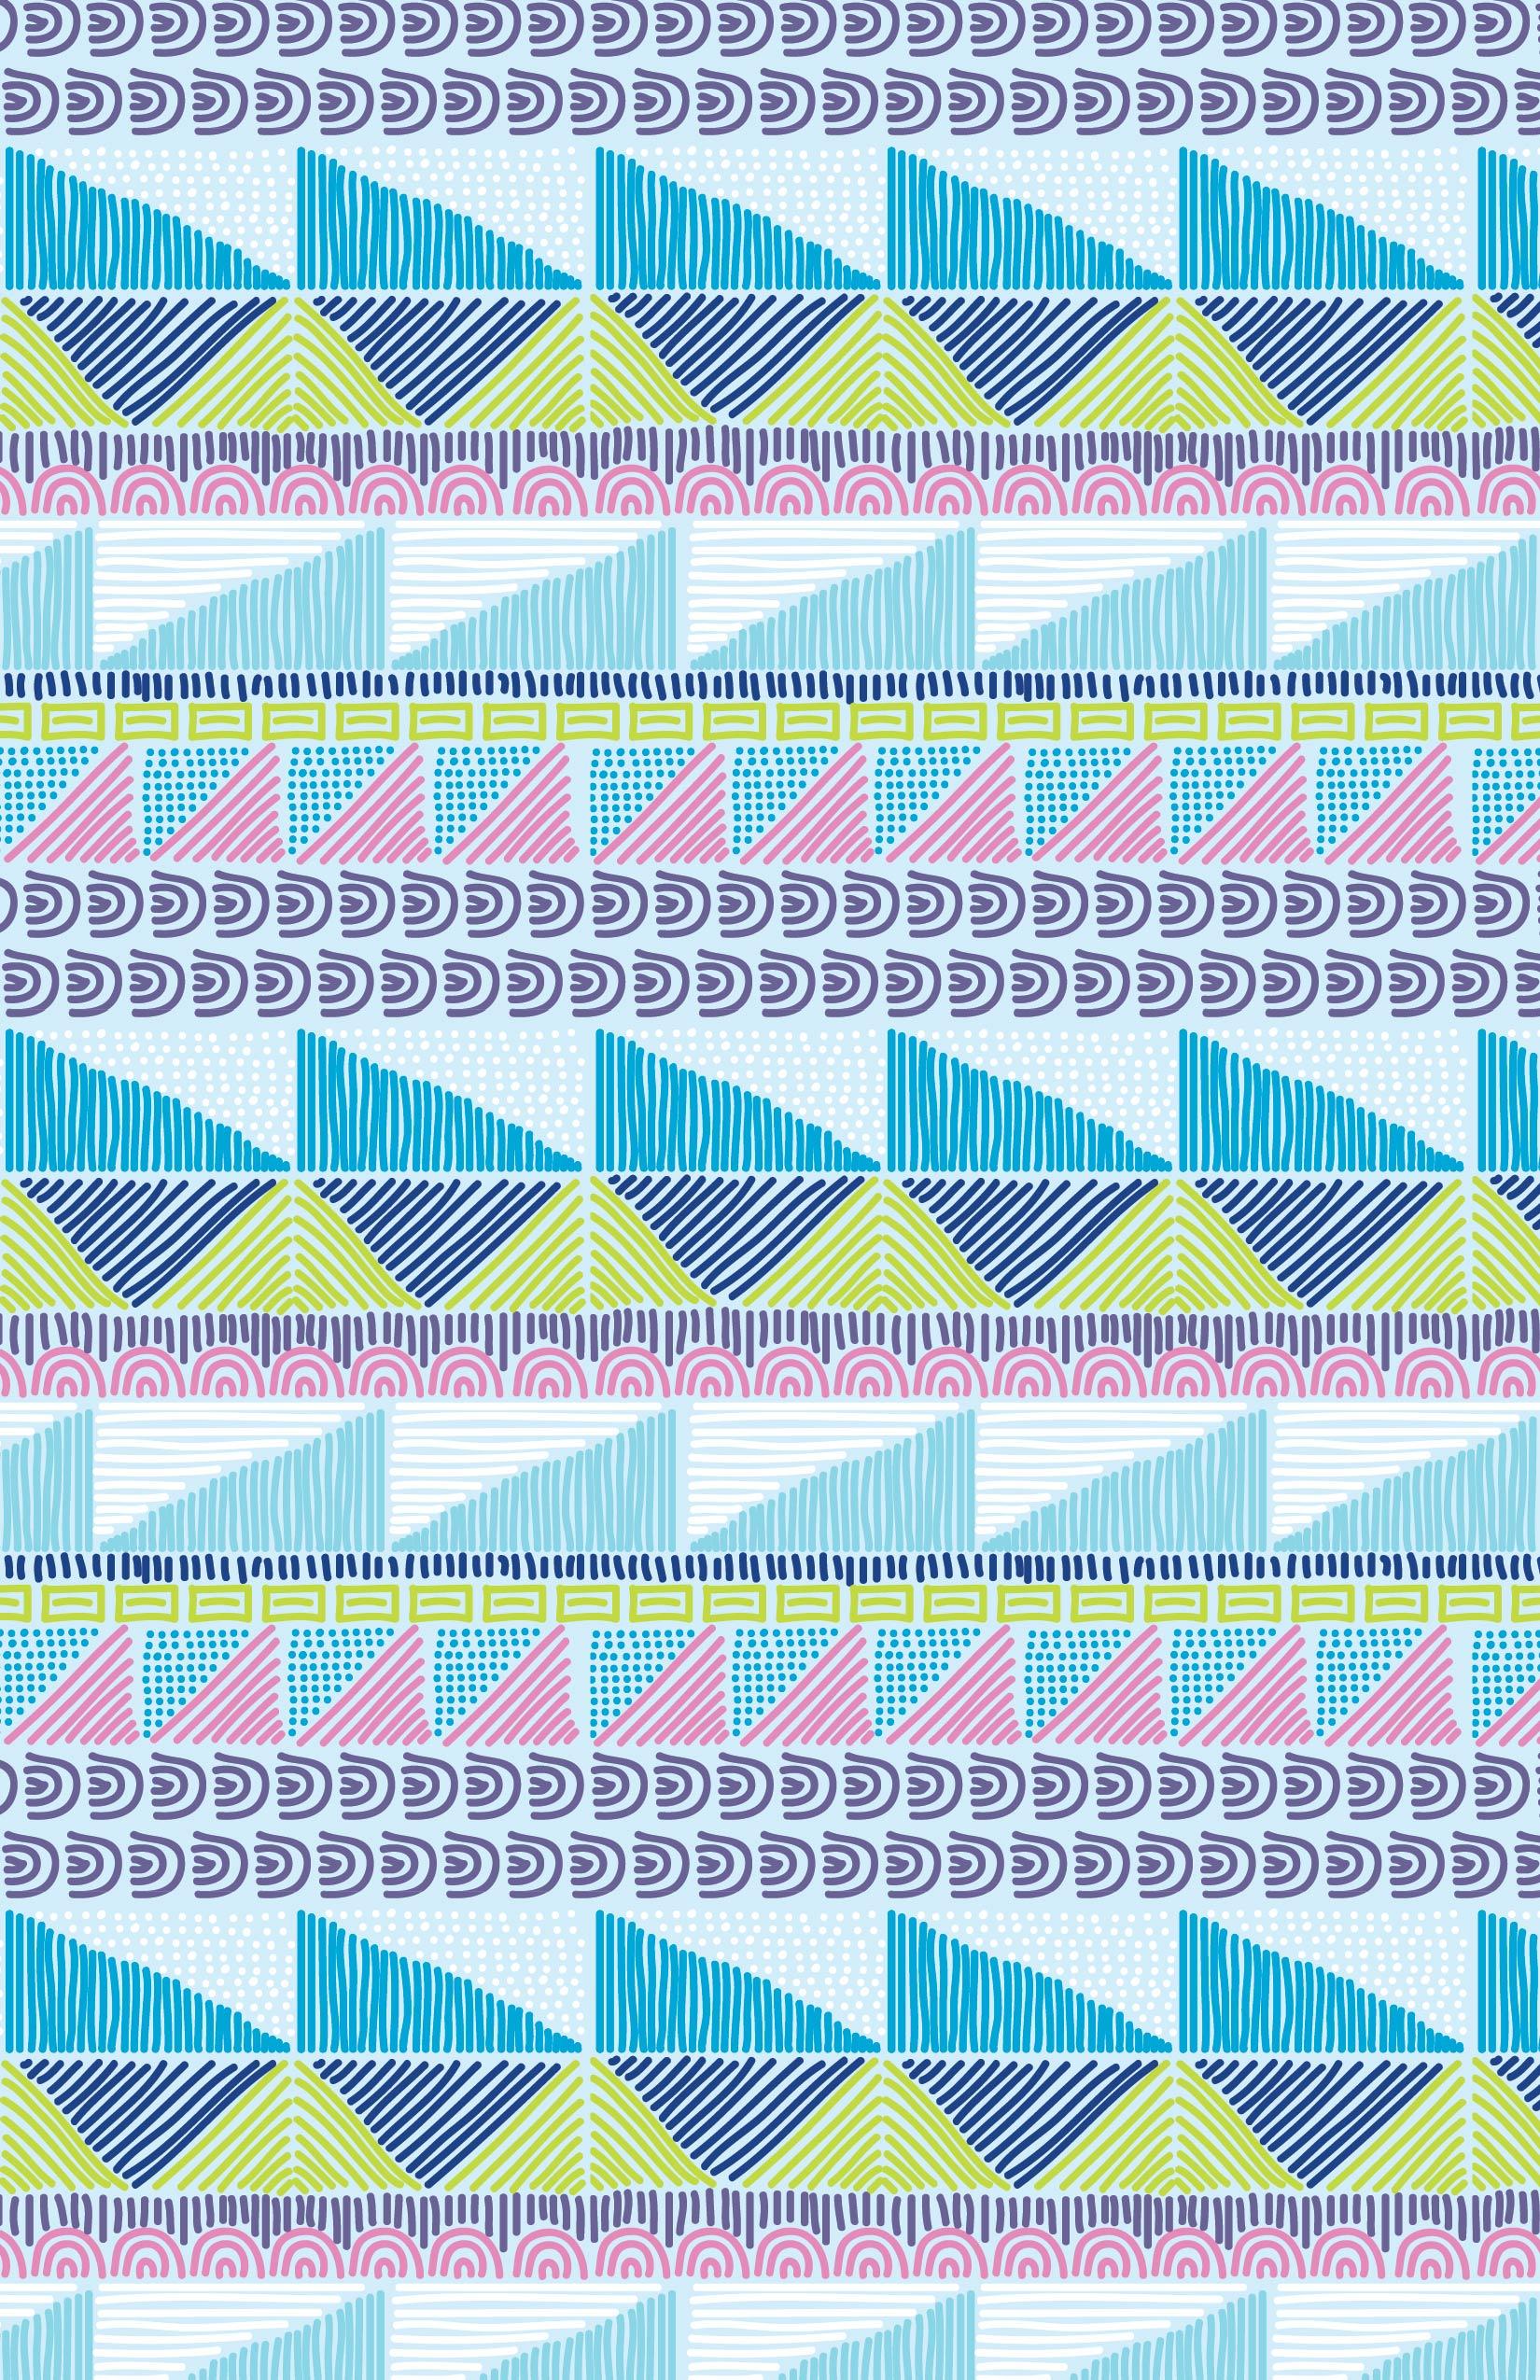 stitch geo_2-01.jpg